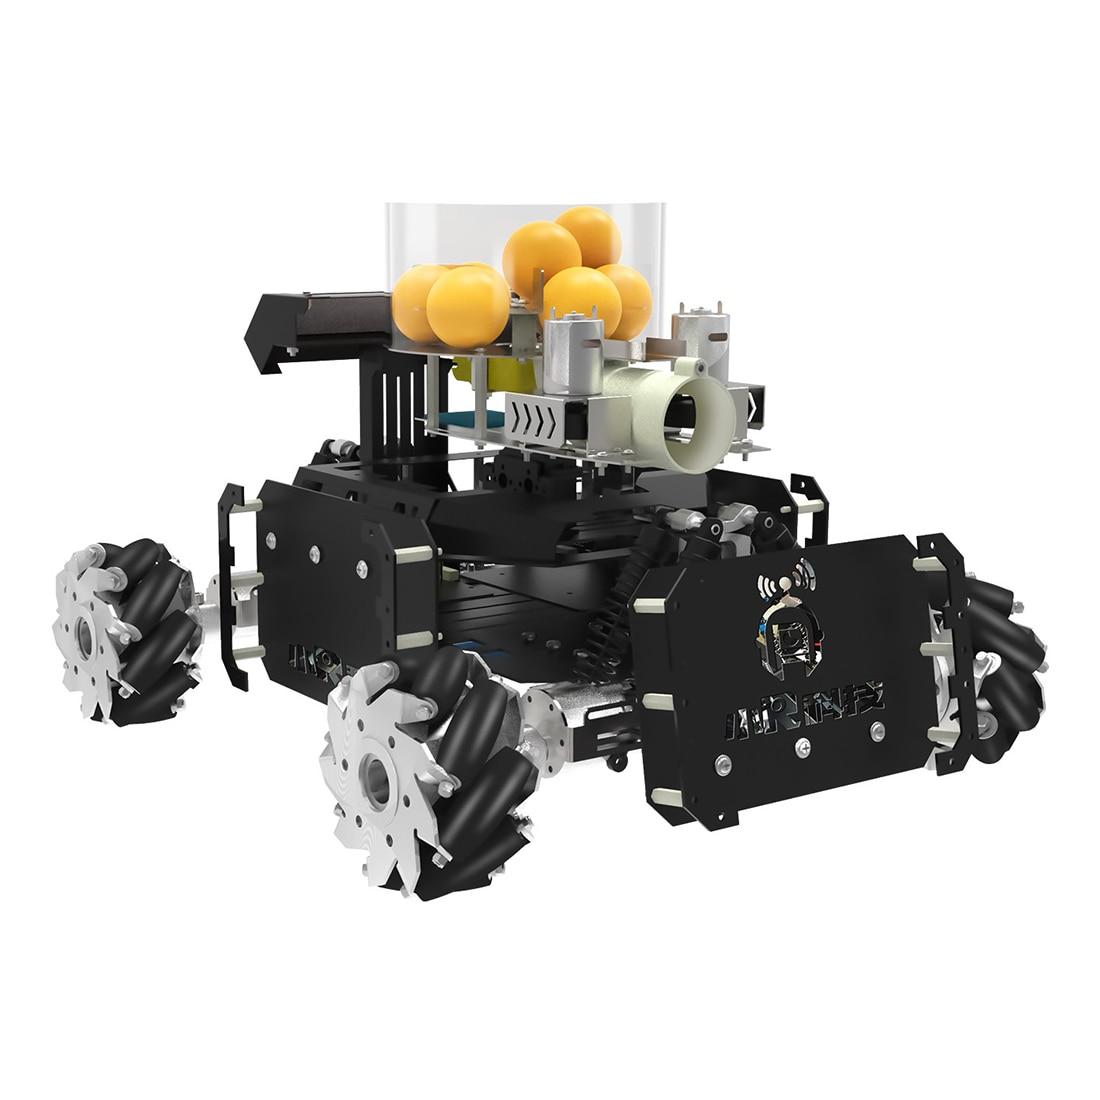 DIY Steam Omni Wheel Turret Chariot VR Video Control XR Master Robot For STM32 Model Educational Toy Gift For Kid Adult - Black